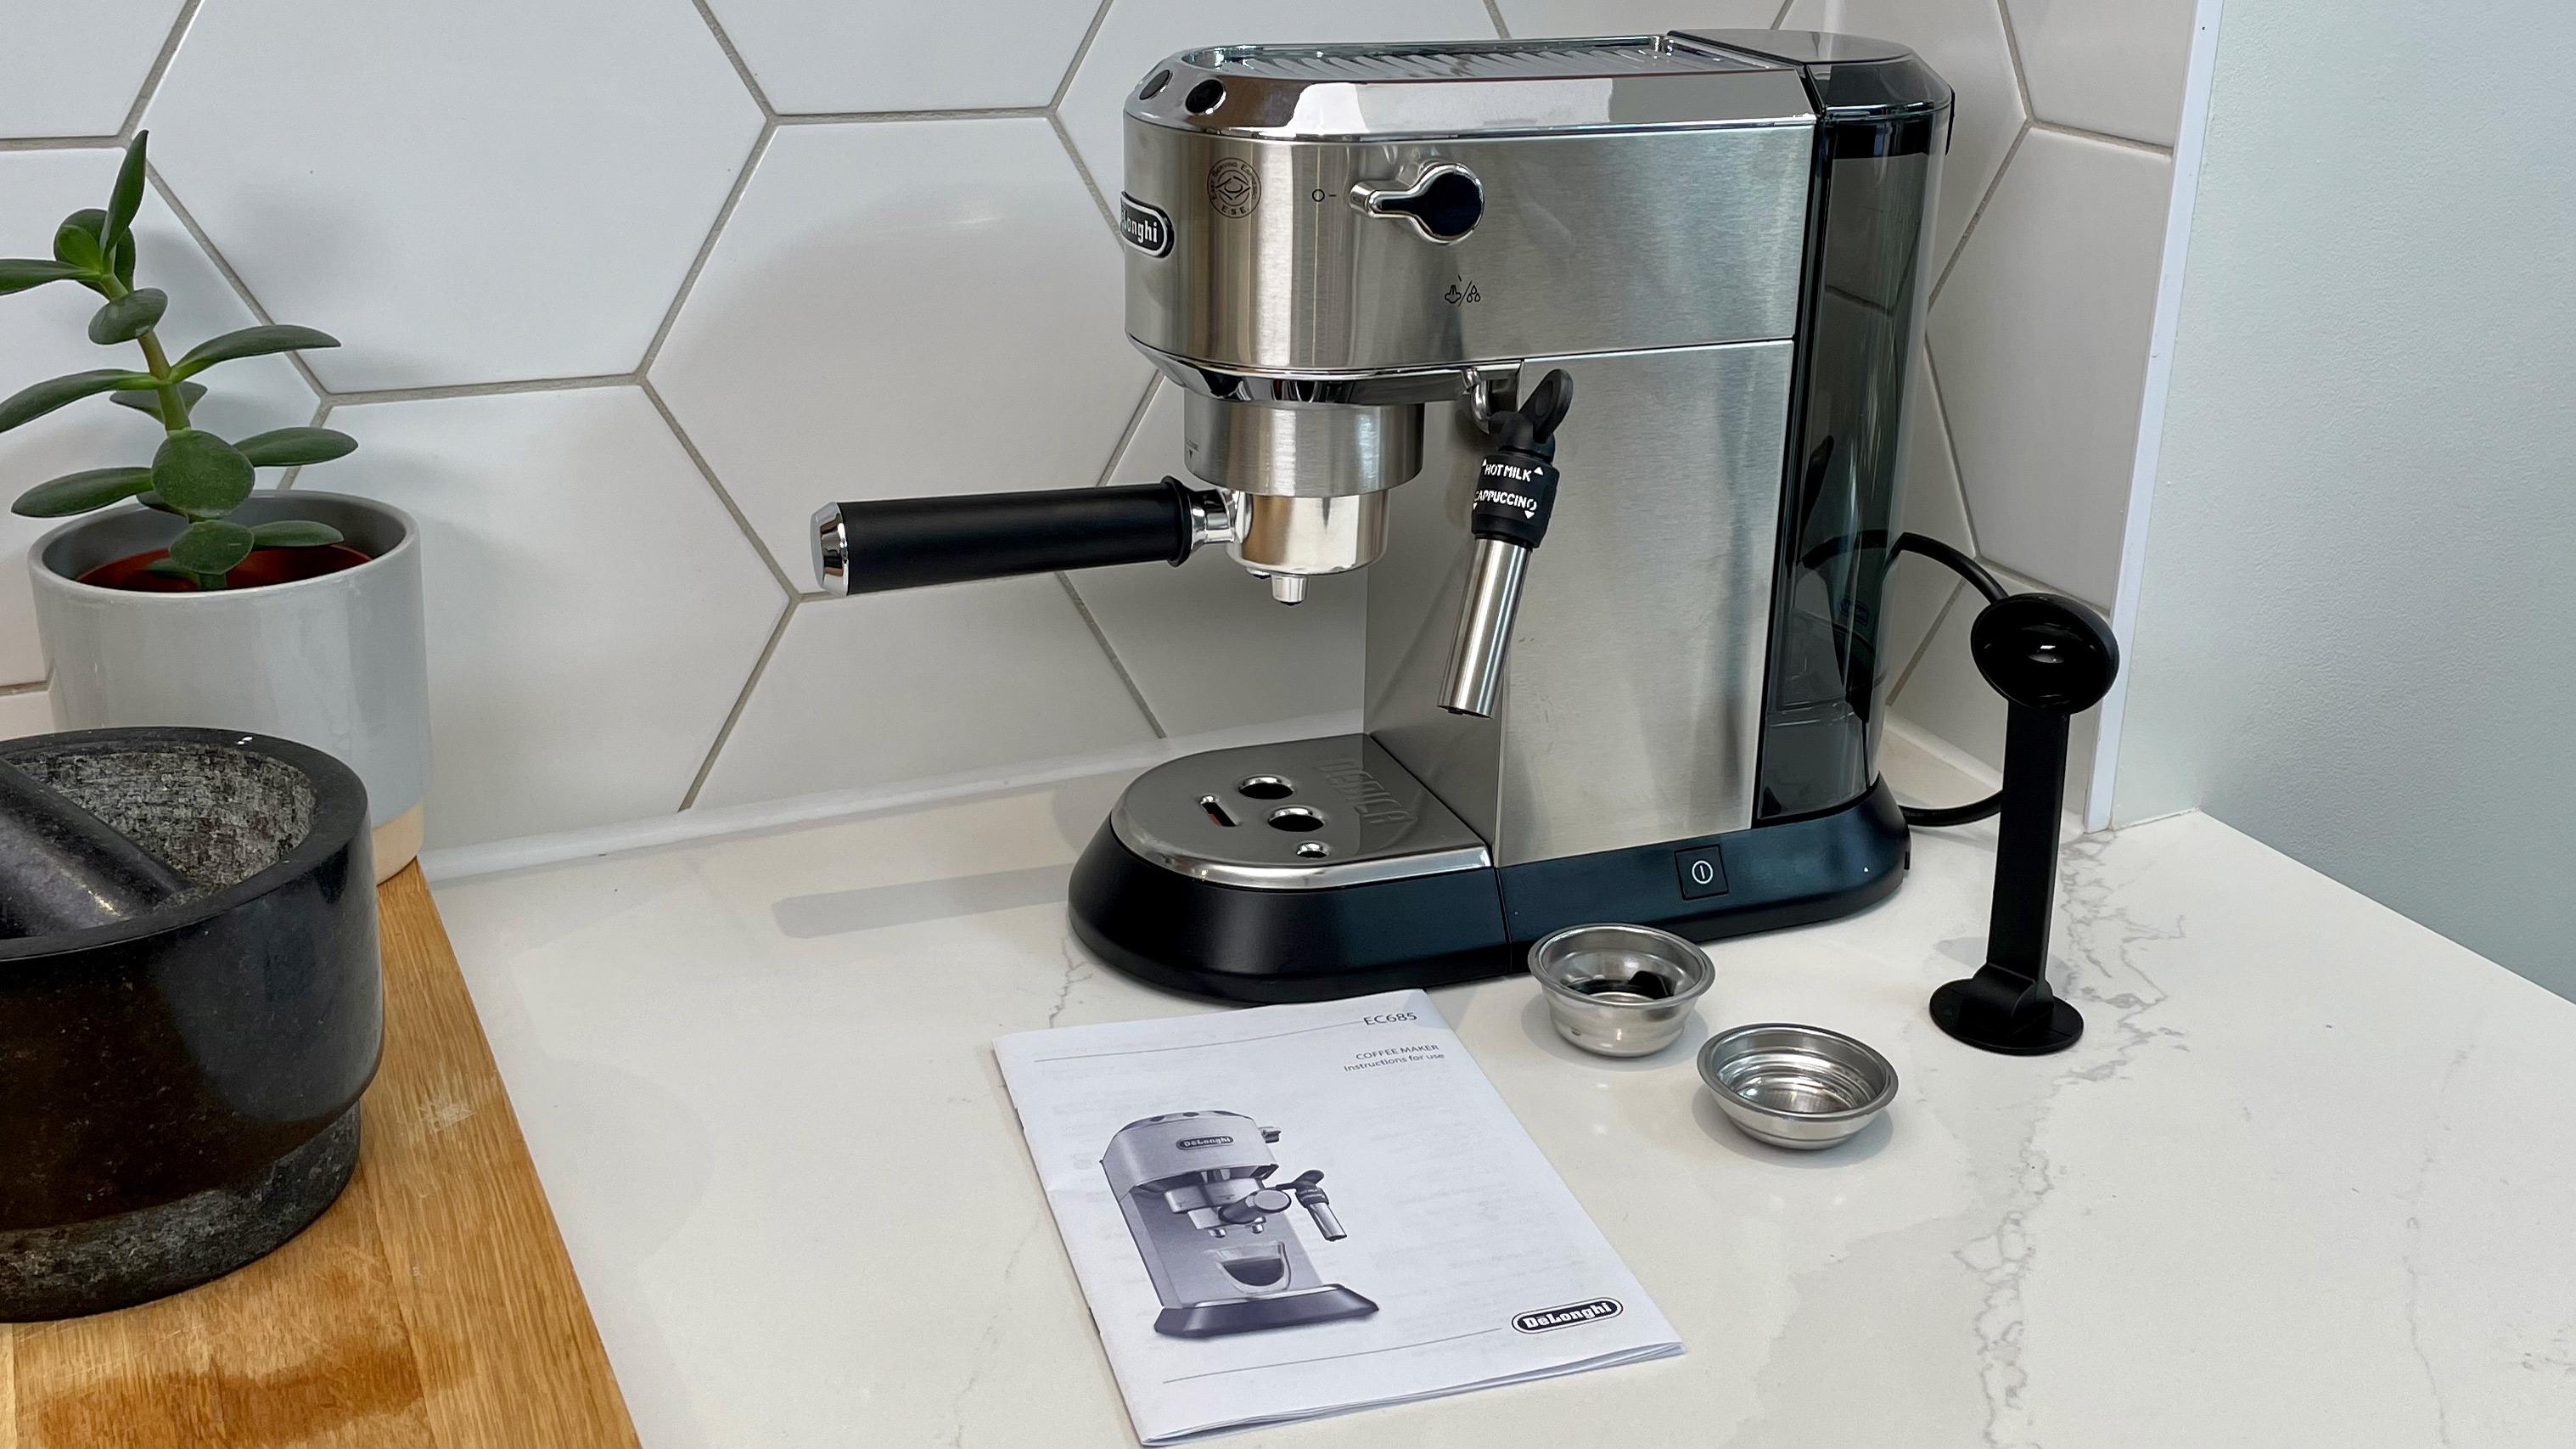 De'Longhi Dedica Style EC685 on a kitchen countertop